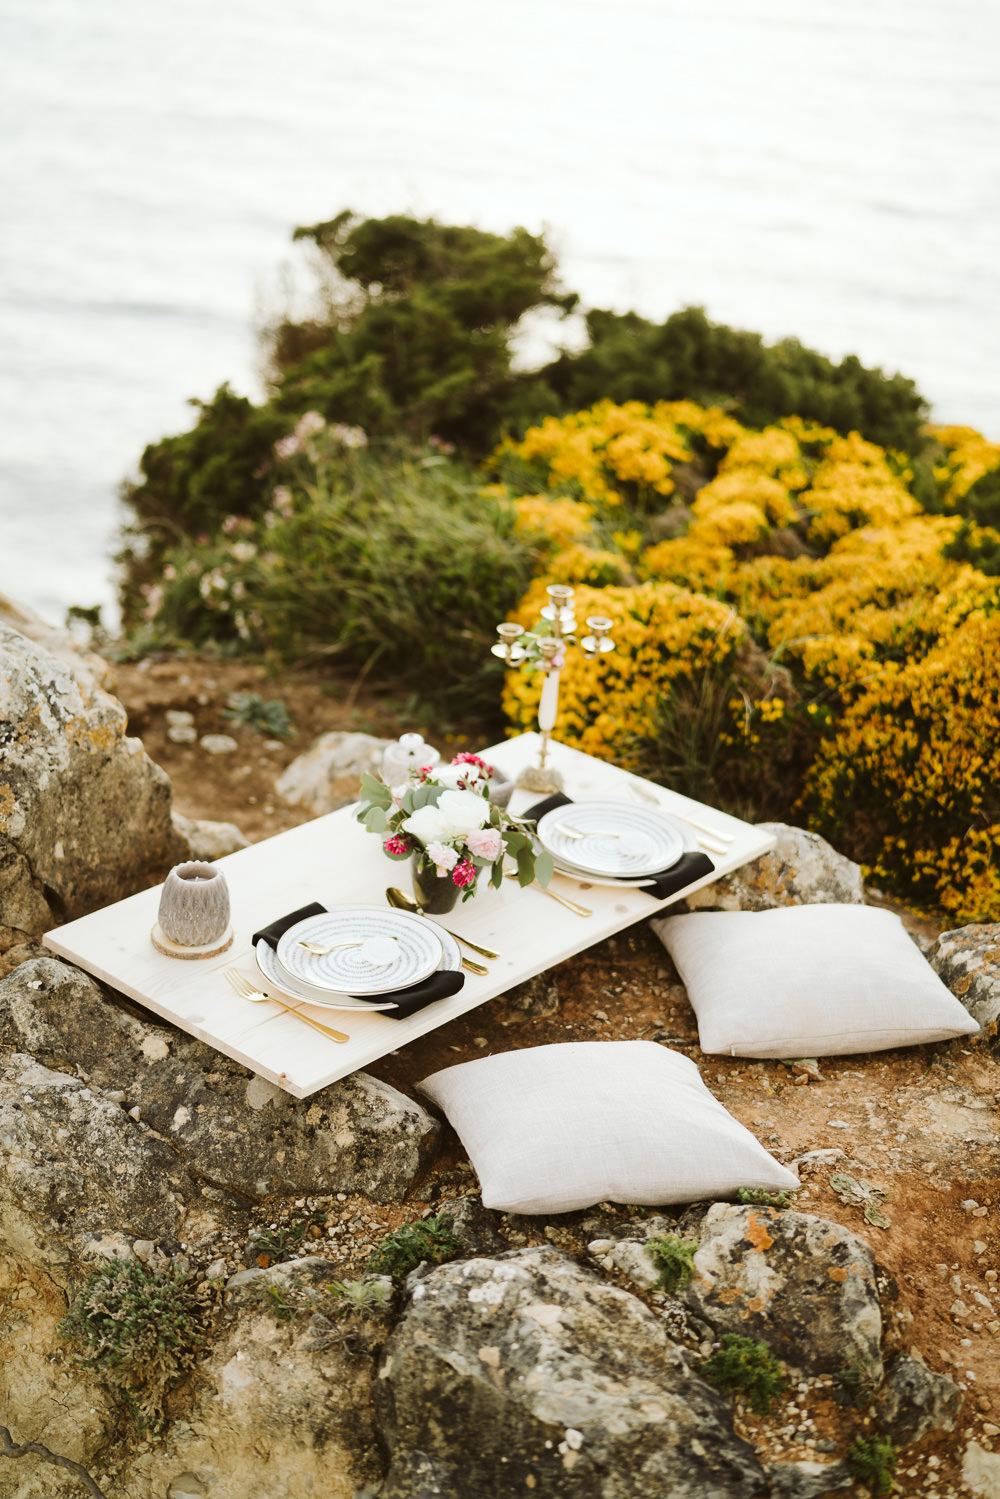 Tablescape Set Up Sweetheart Table Clifftop Portugal Wedding Ideas John Barwood Photography